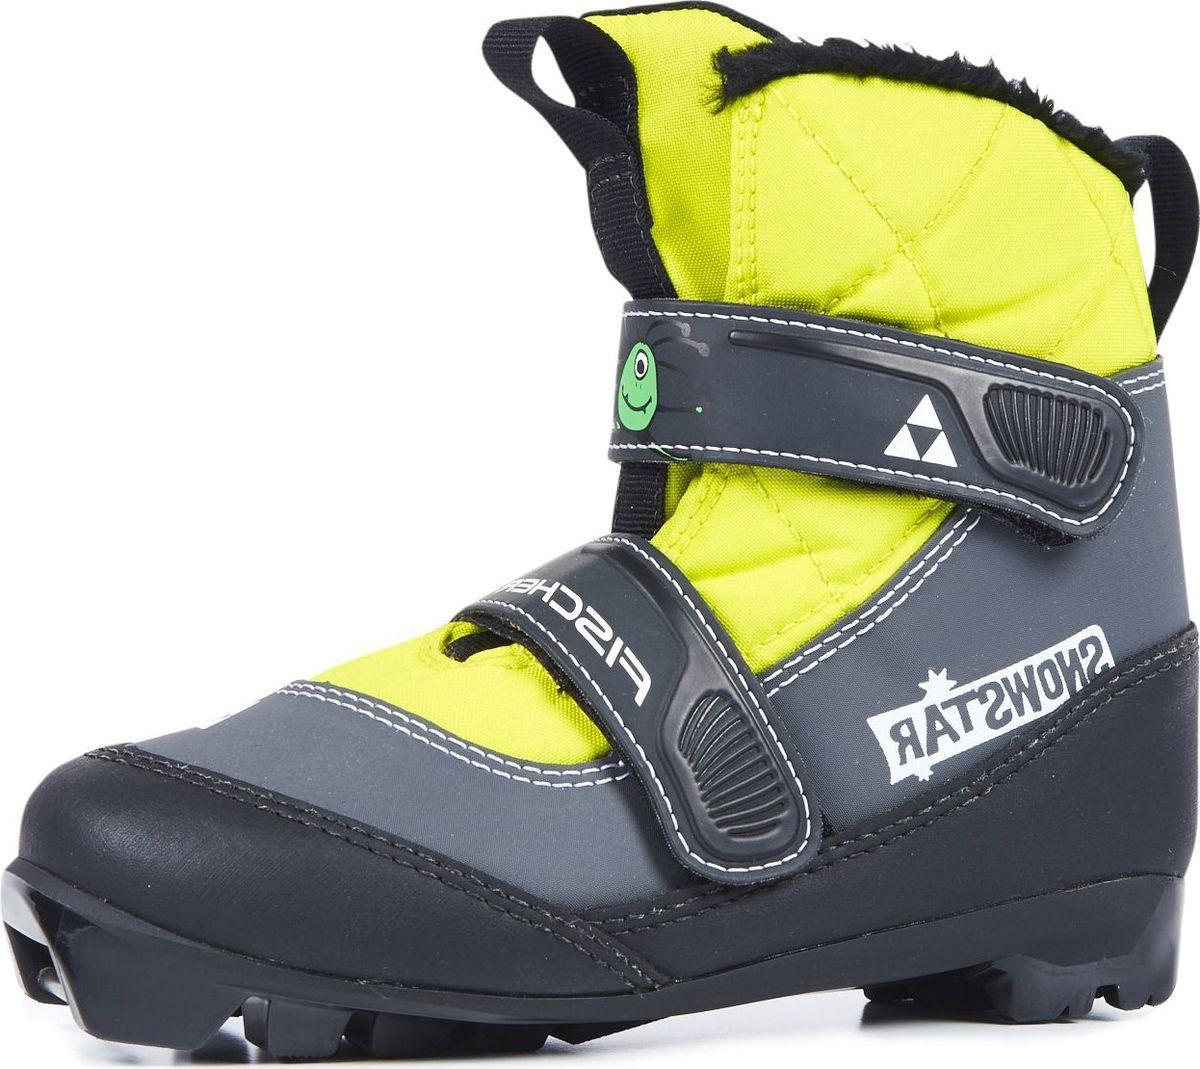 Ботинки лыжные Fischer цены